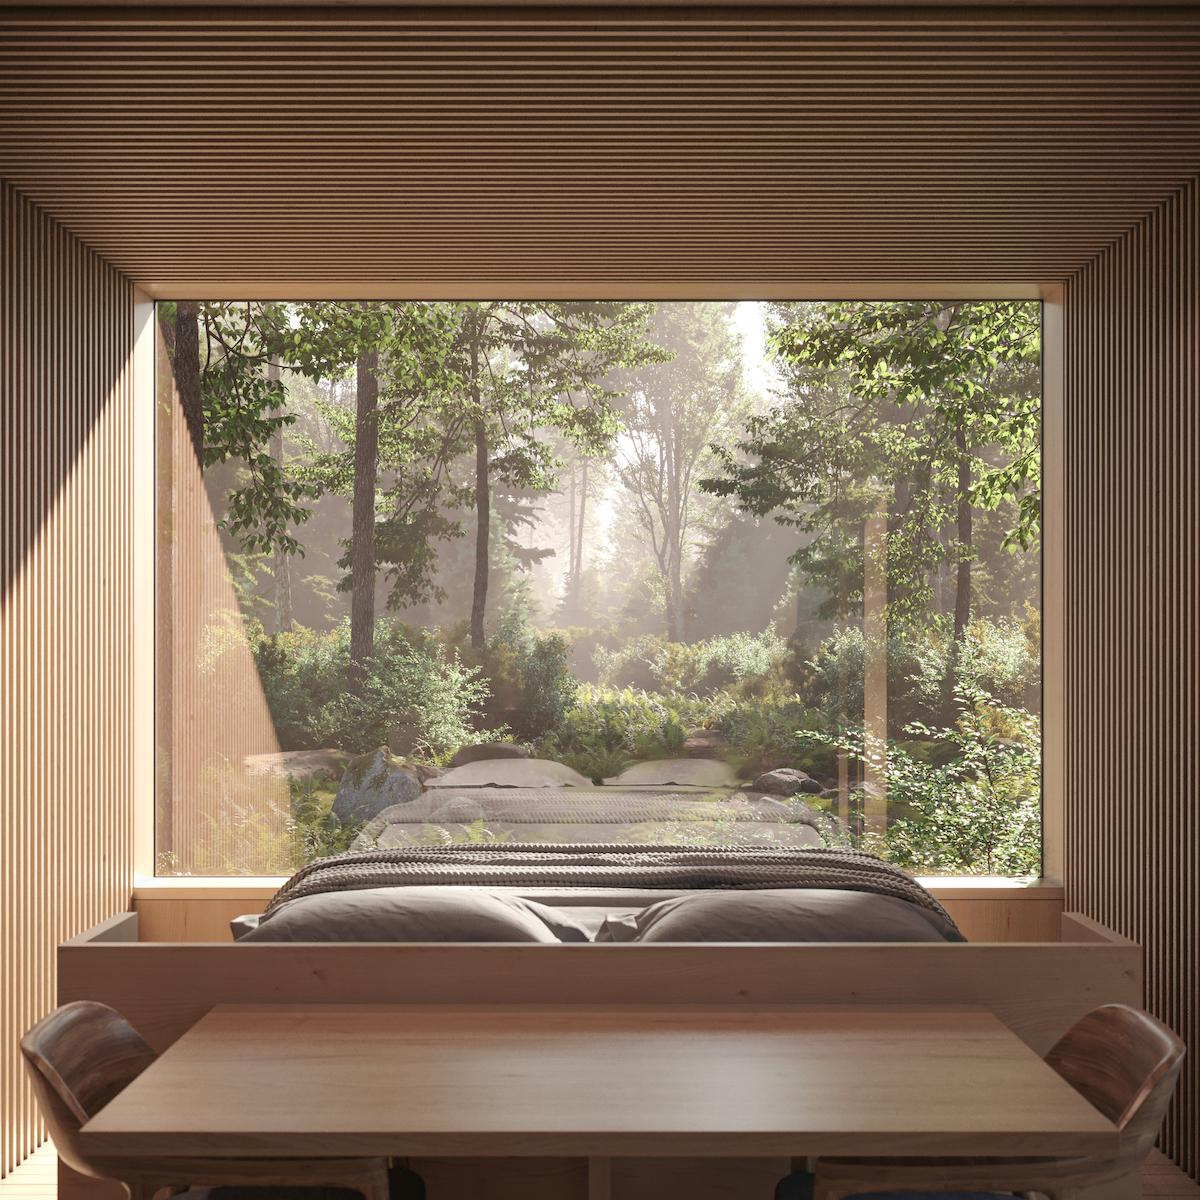 Bedroom Interior of Arcana Mirrored Cabin